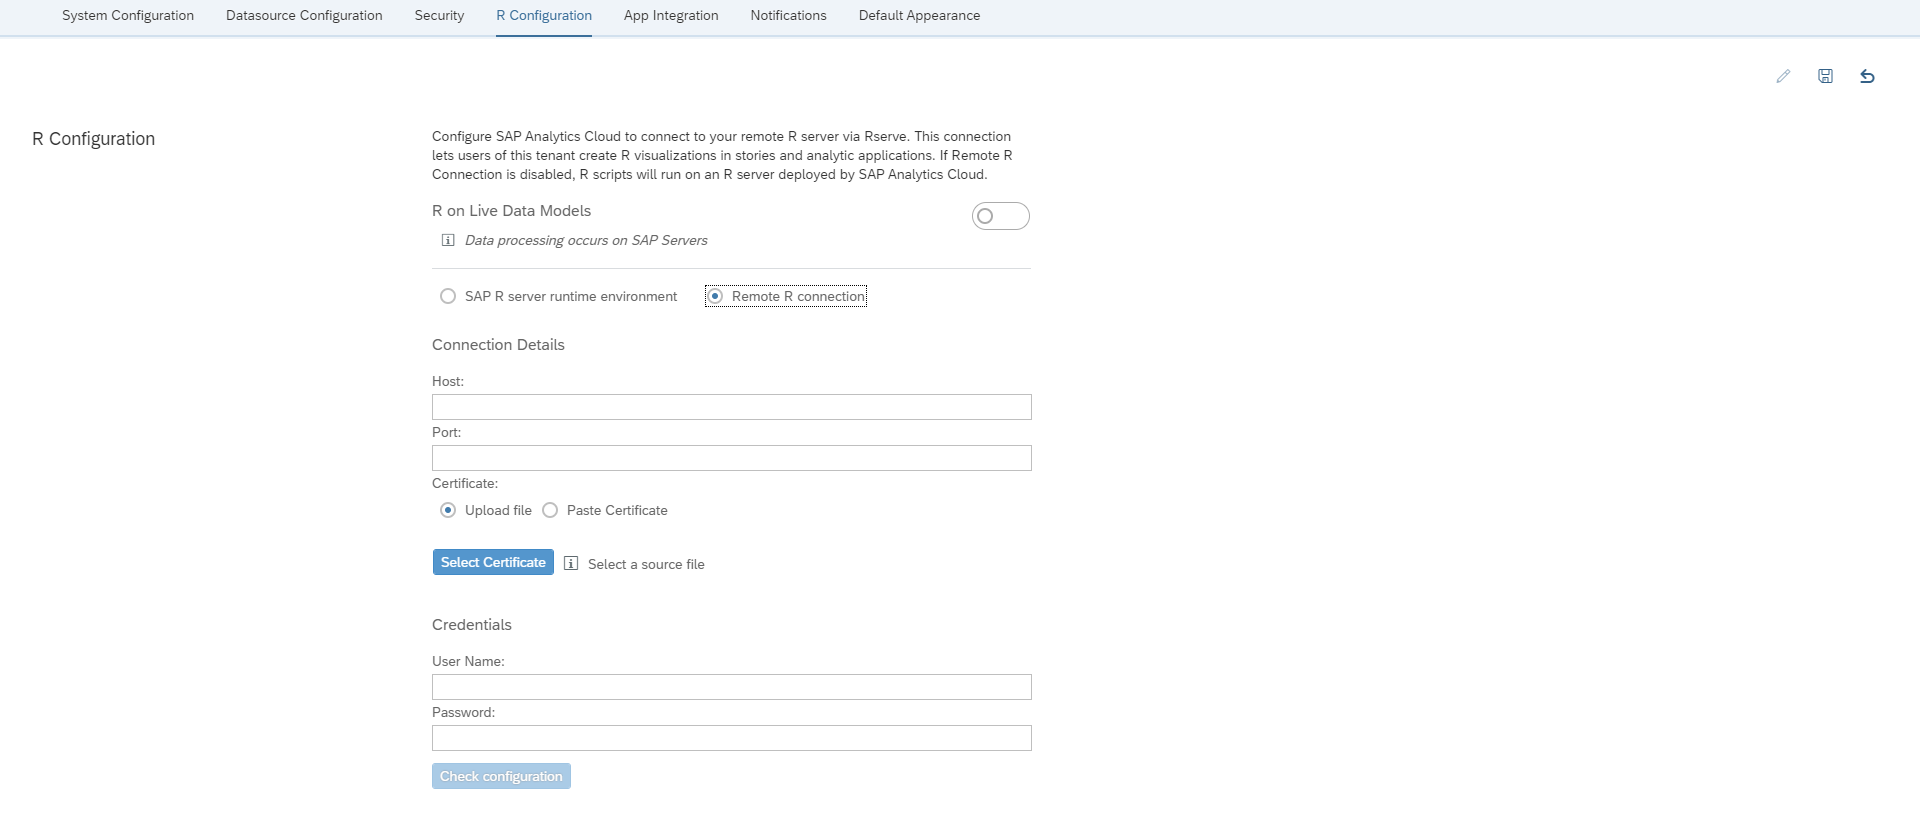 sap-analytics-cloud-with-r-integration